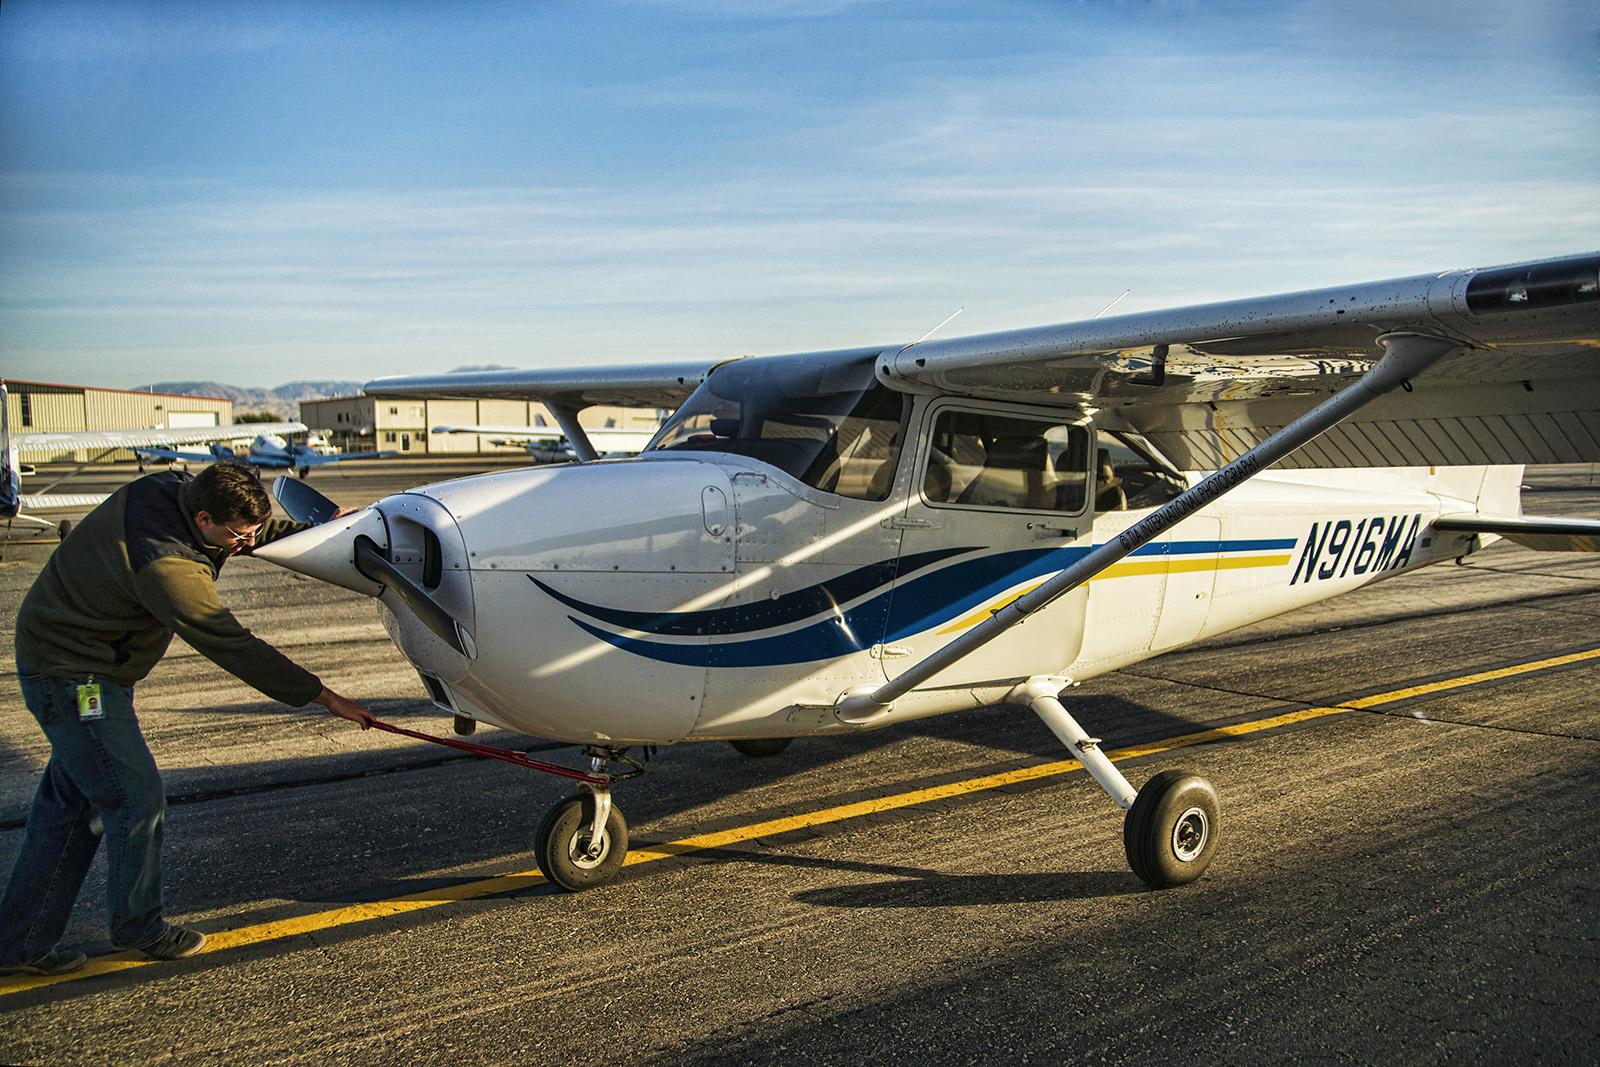 Small aircraft, Boise, Idaho.